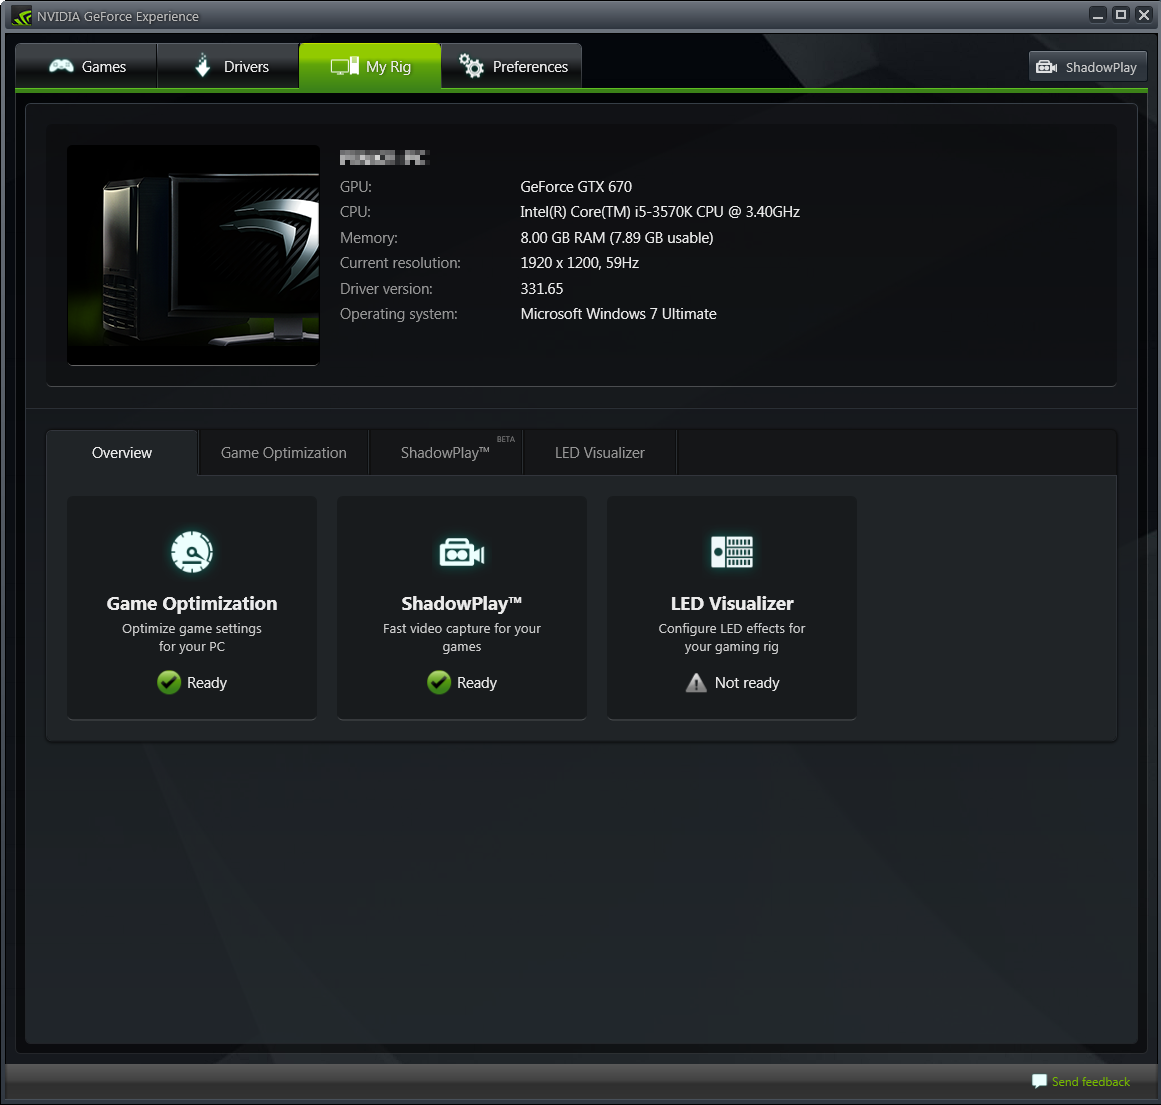 NVIDIA GeForce Experience 3 دانلود نرم افزار بهینه سازی بازی ها NVIDIA GeForce Experience